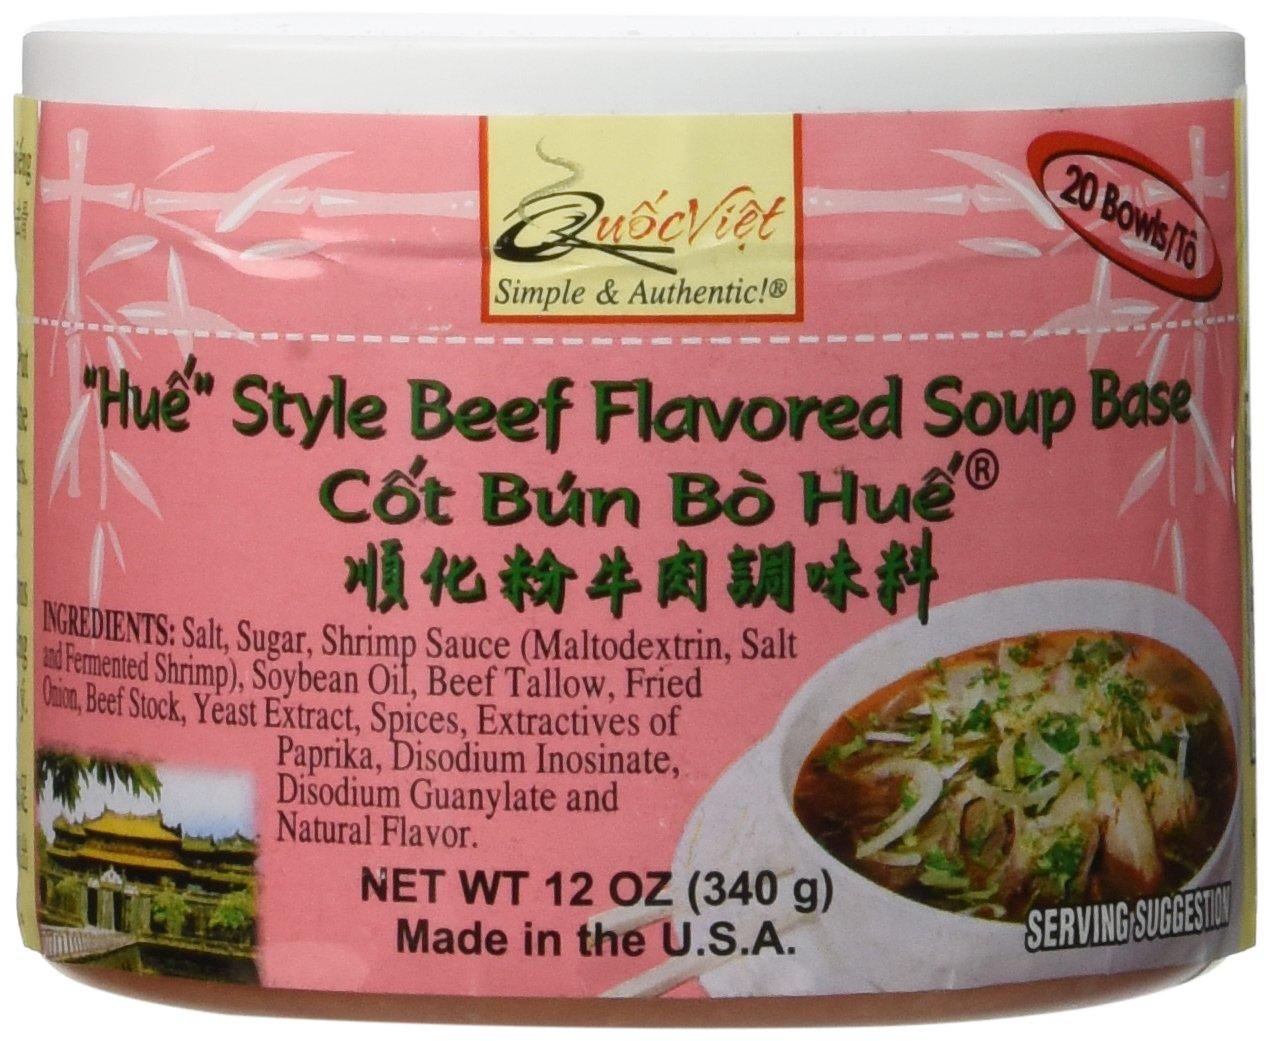 Quoc Viet Foods ''Hue'' Style Beef Flavored Soup Base, 12 oz jar (1 unit) by Quoc Viet Foods